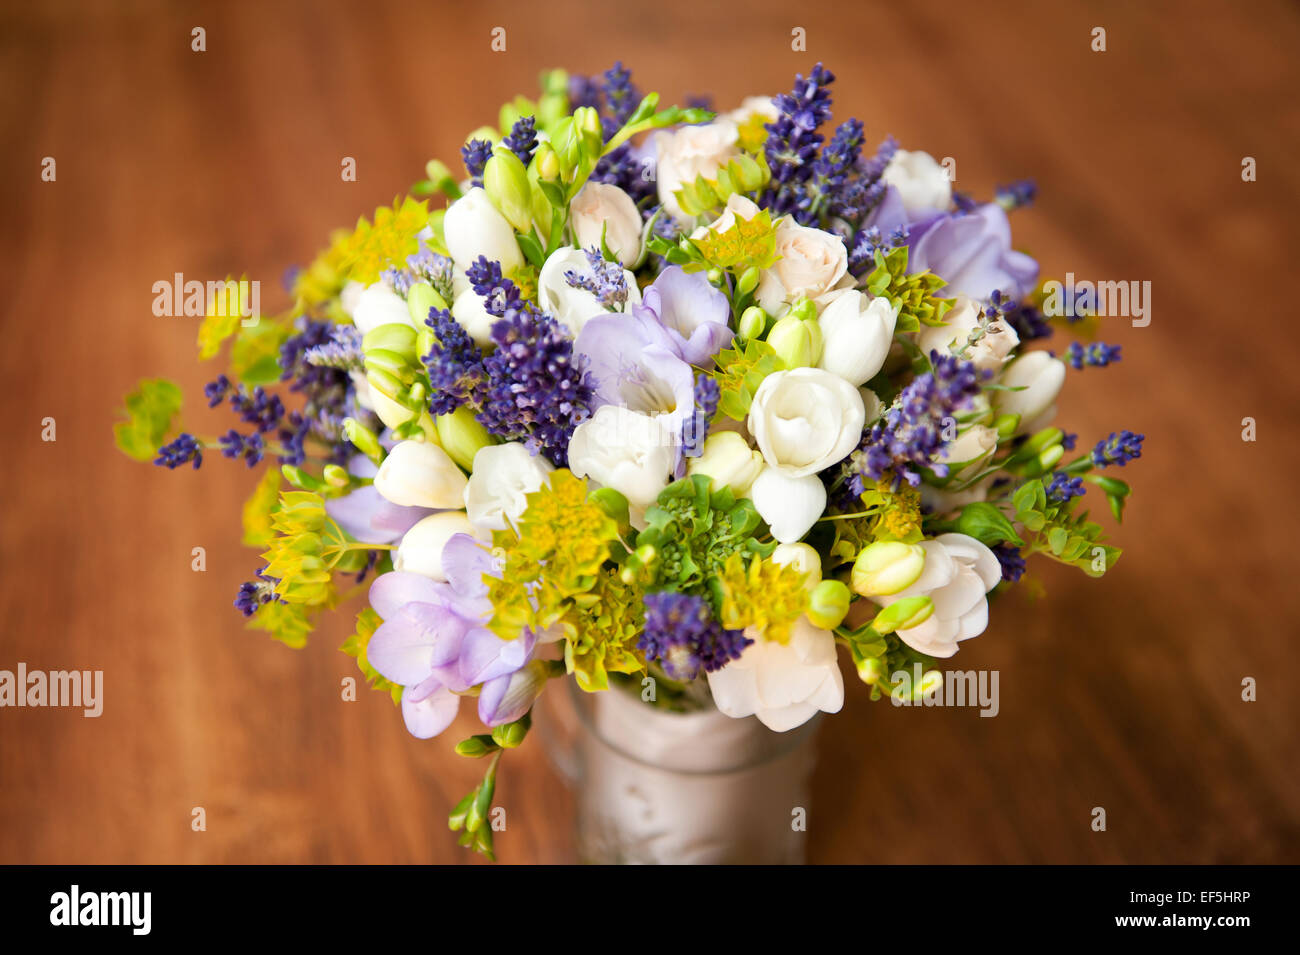 Bridal freesia purple bouquet wedding flowers Stock Photo: 78185066 ...